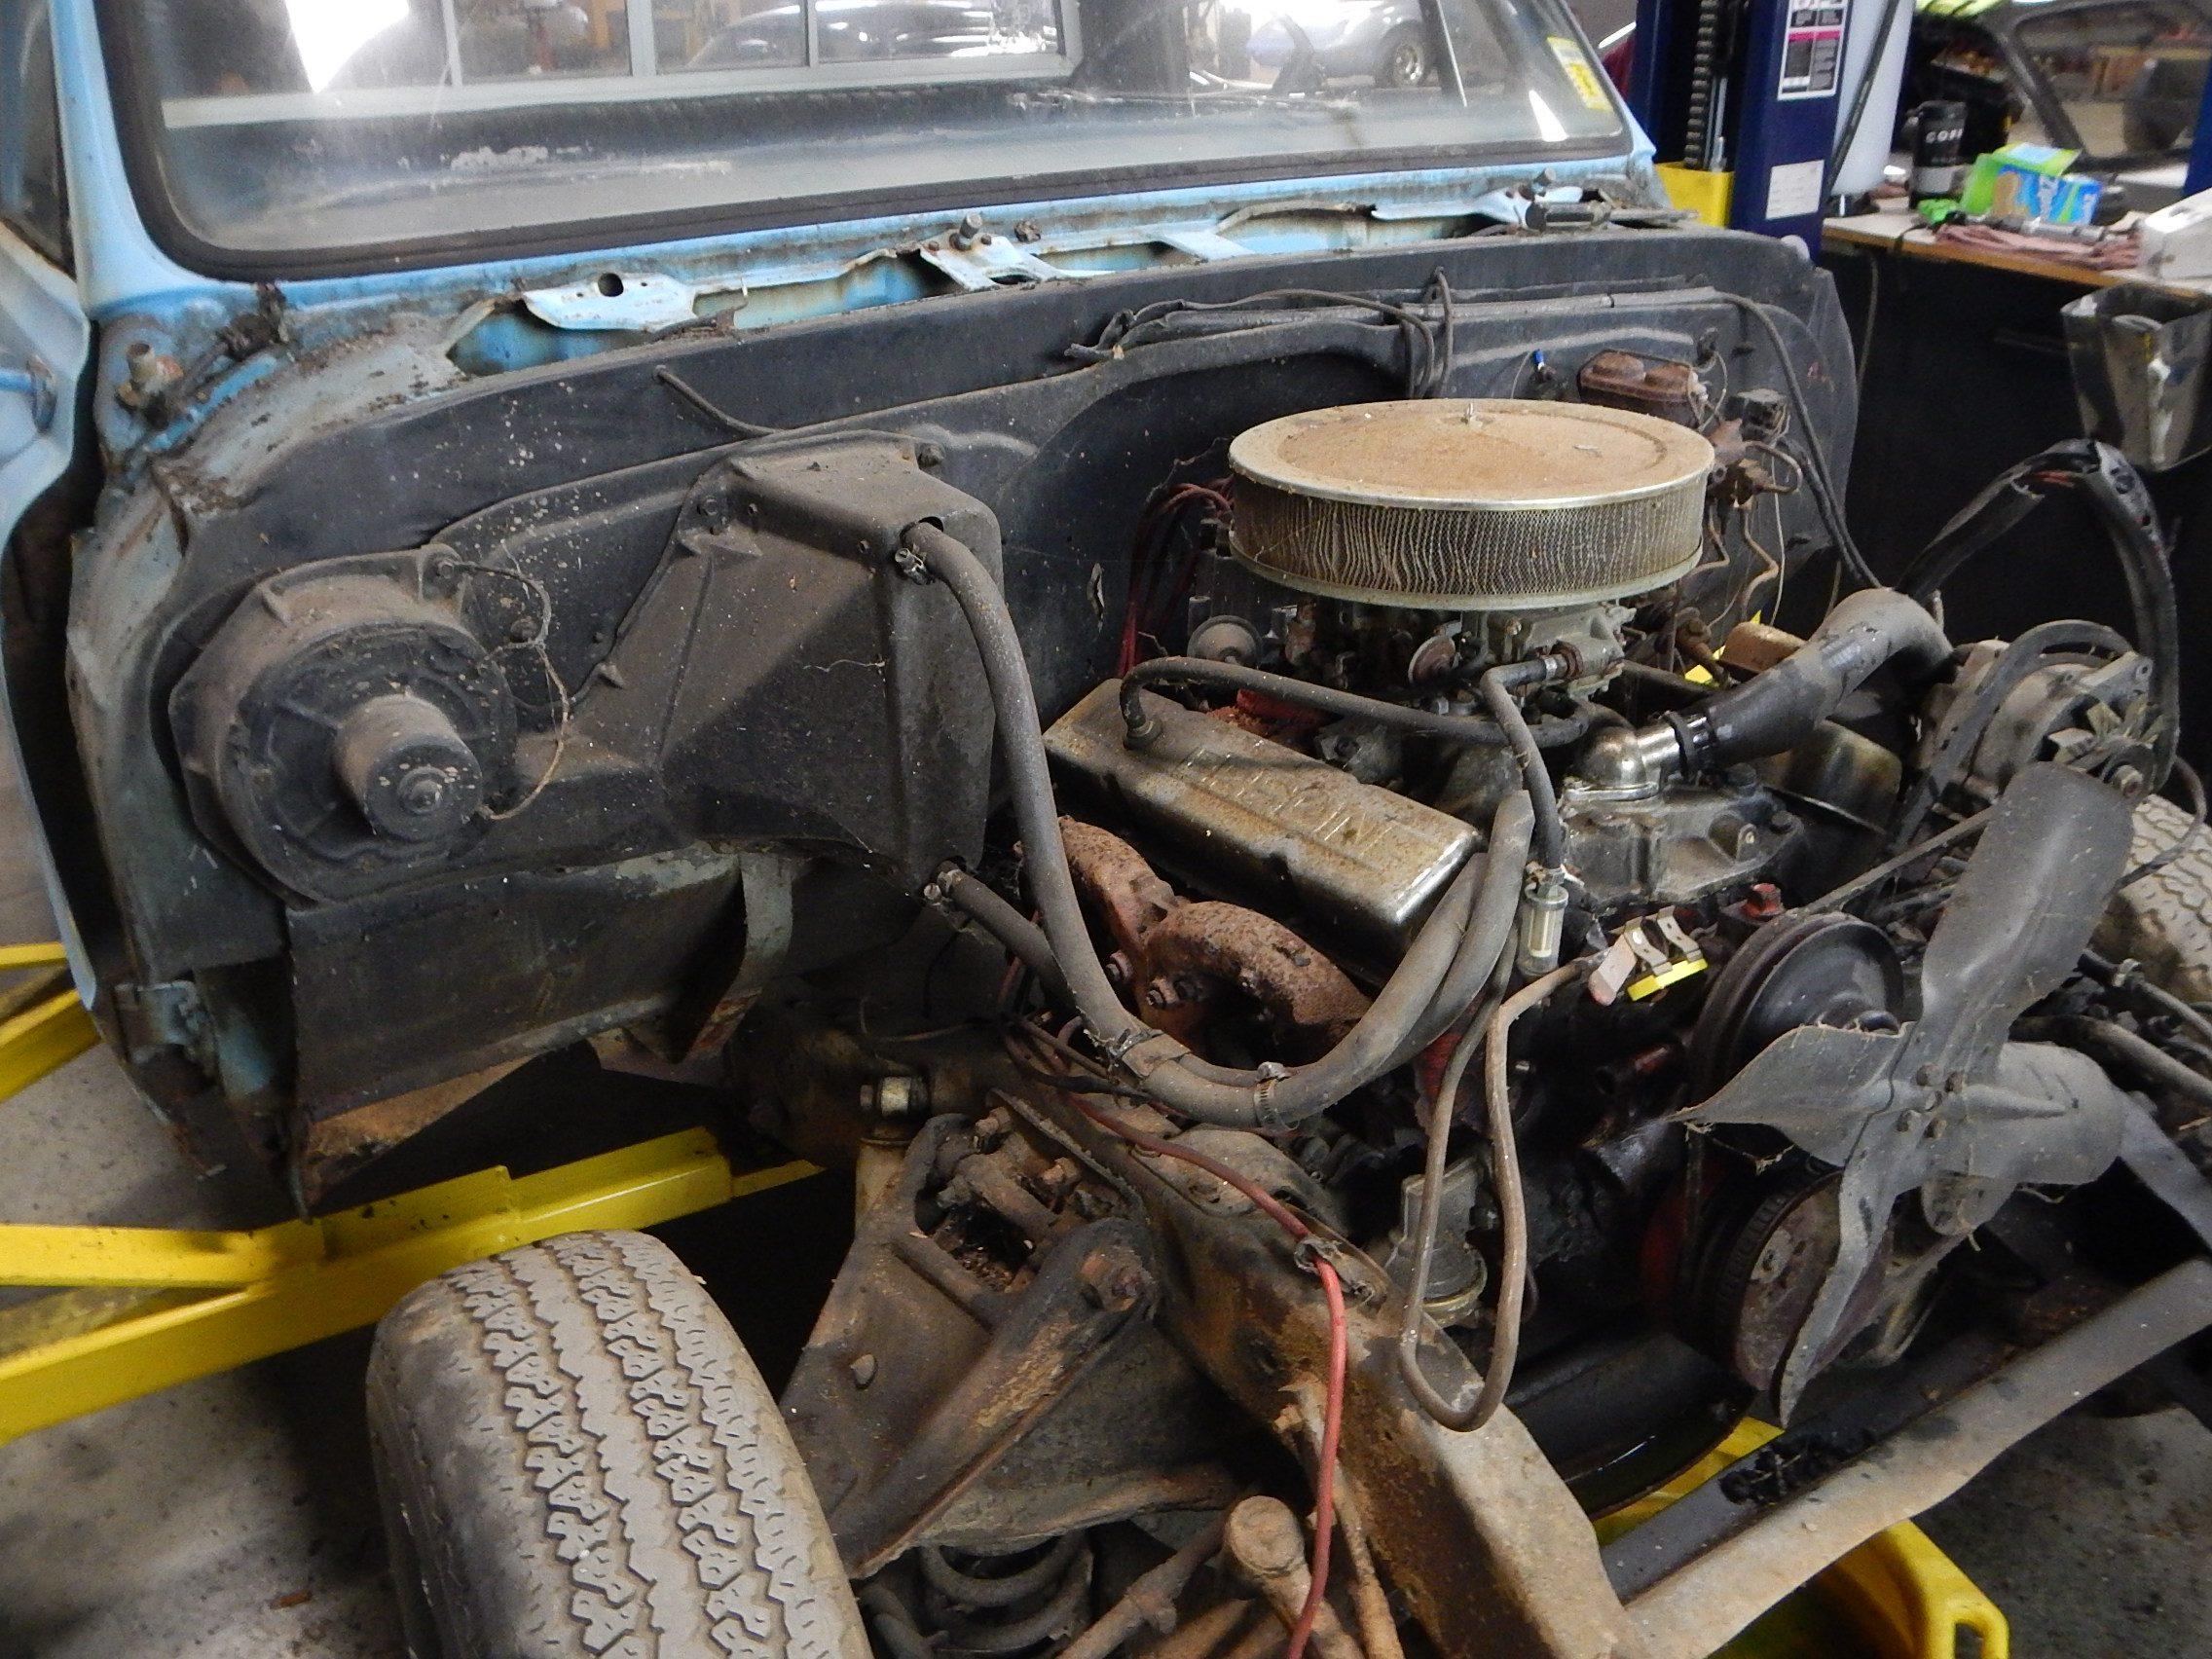 1967 Chevy C-10 restoration 21.jpg